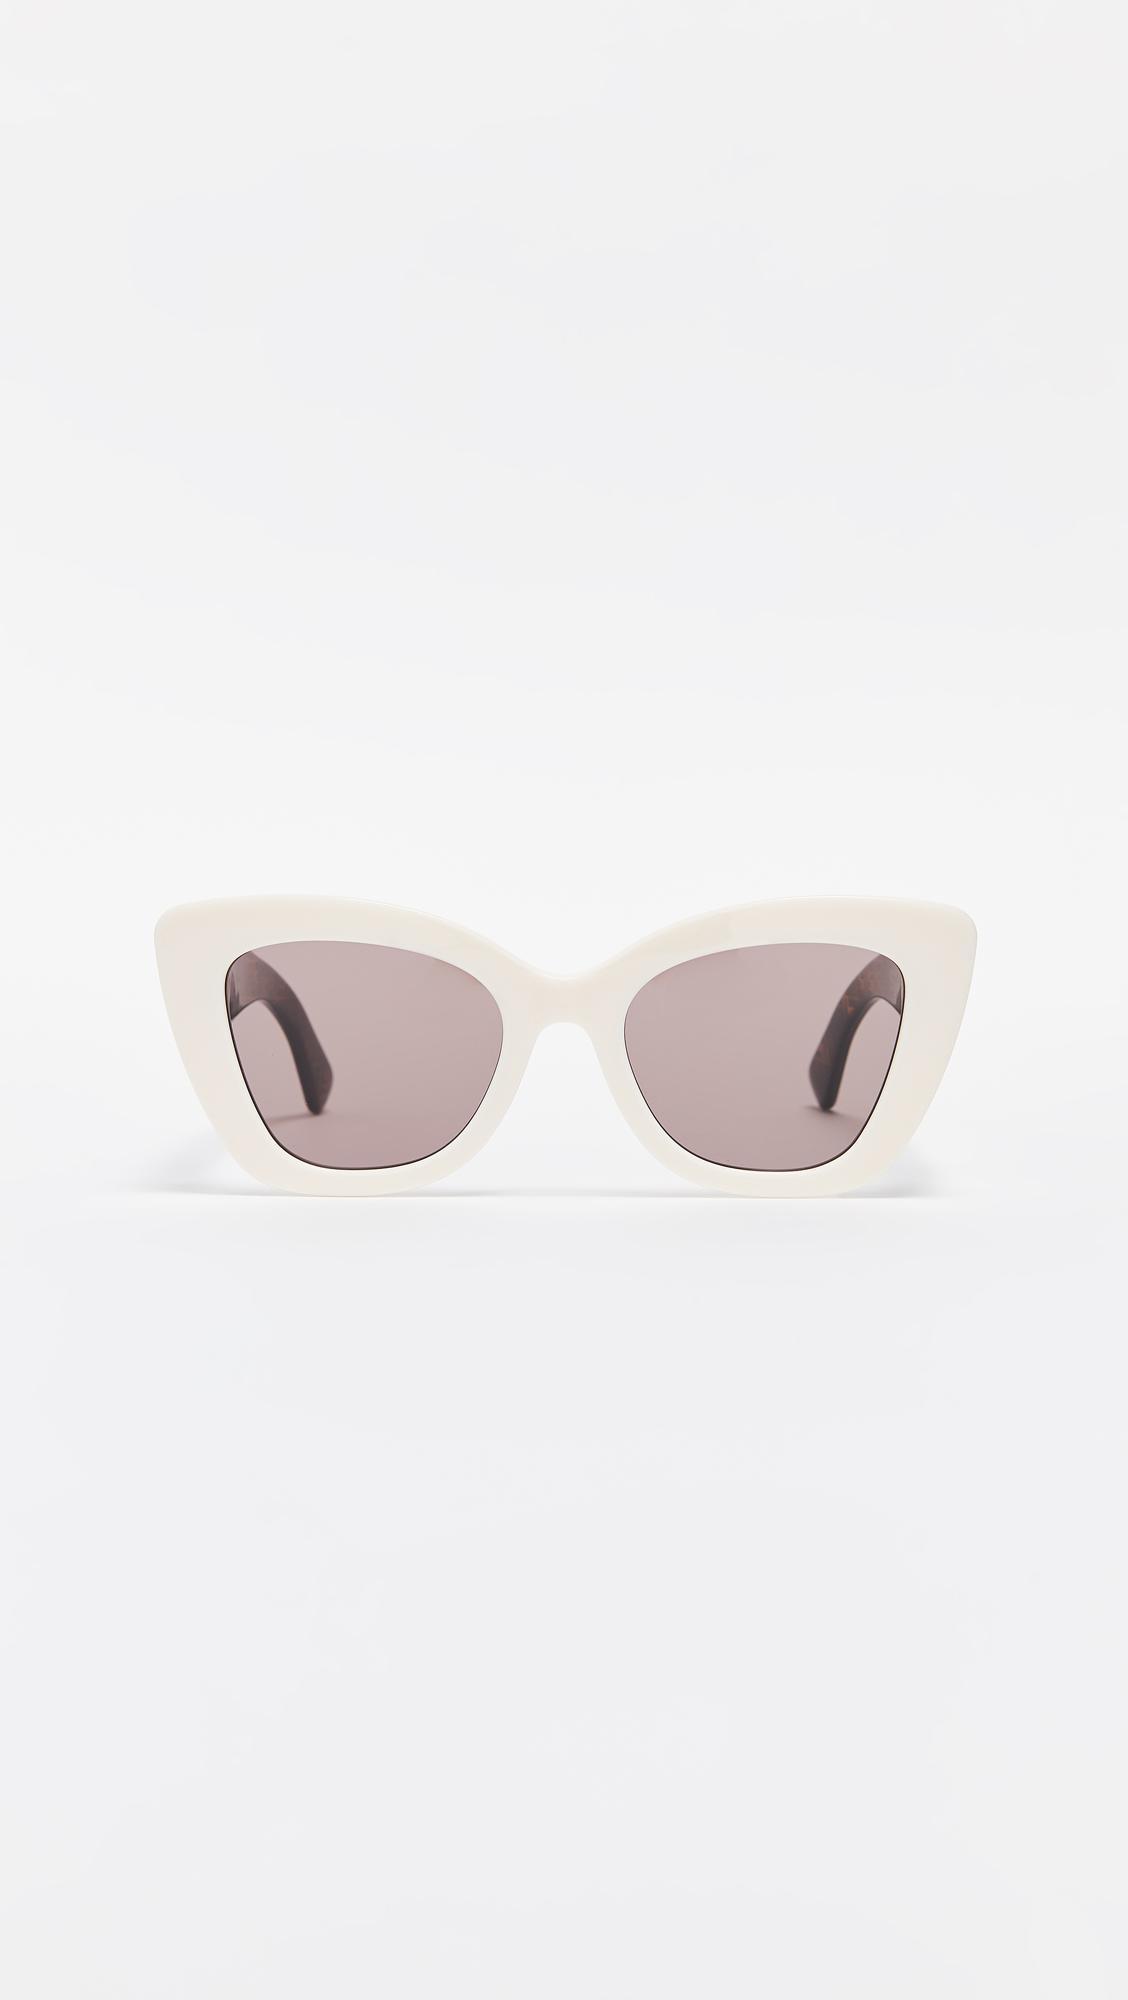 ad6fd069a4f Lyst - Fendi Narrow Cat Eye Logo Sunglasses in White